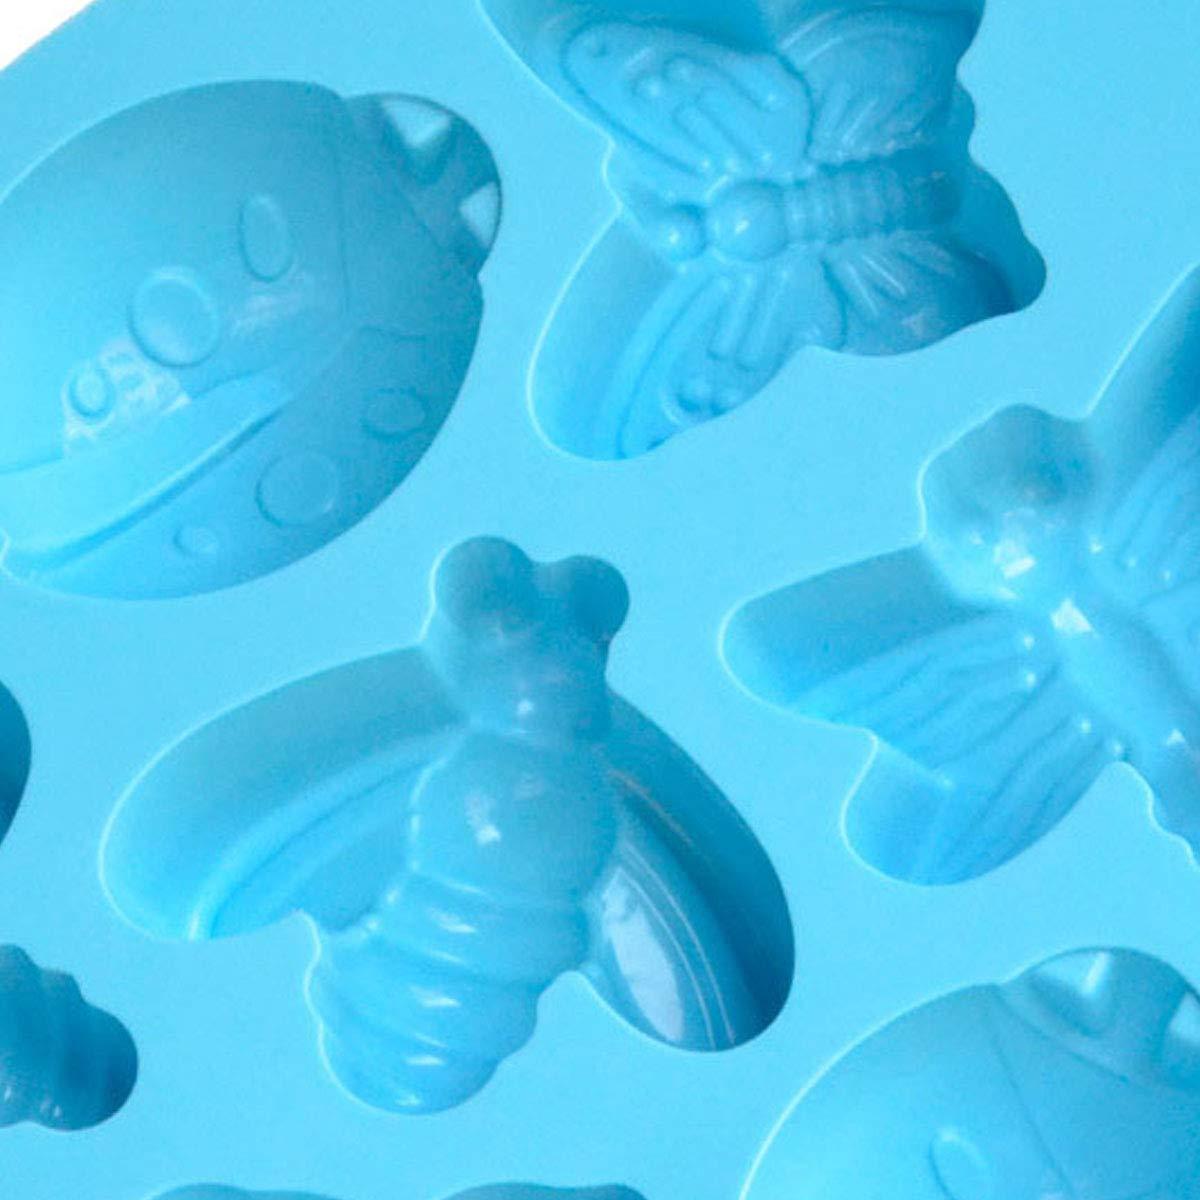 20 Wmaple Molde para pastel de silicona y animal Molde de chocolate para hornear Molde de jalea Decoraci/ón de pastel Azul 26.5 3.2cm